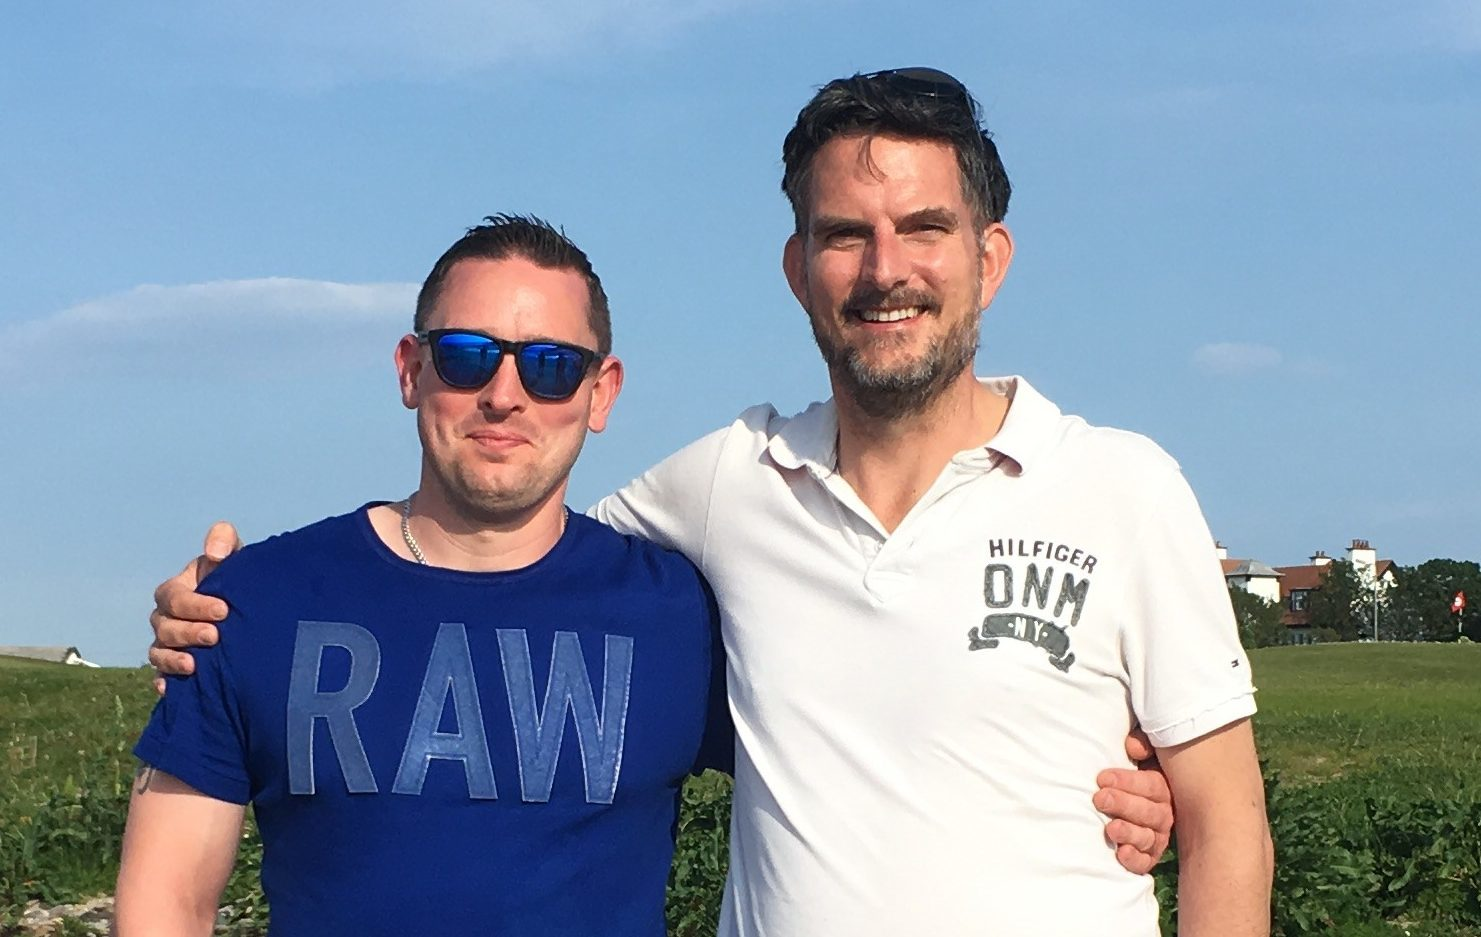 David (left) and Brett finally meet face to face